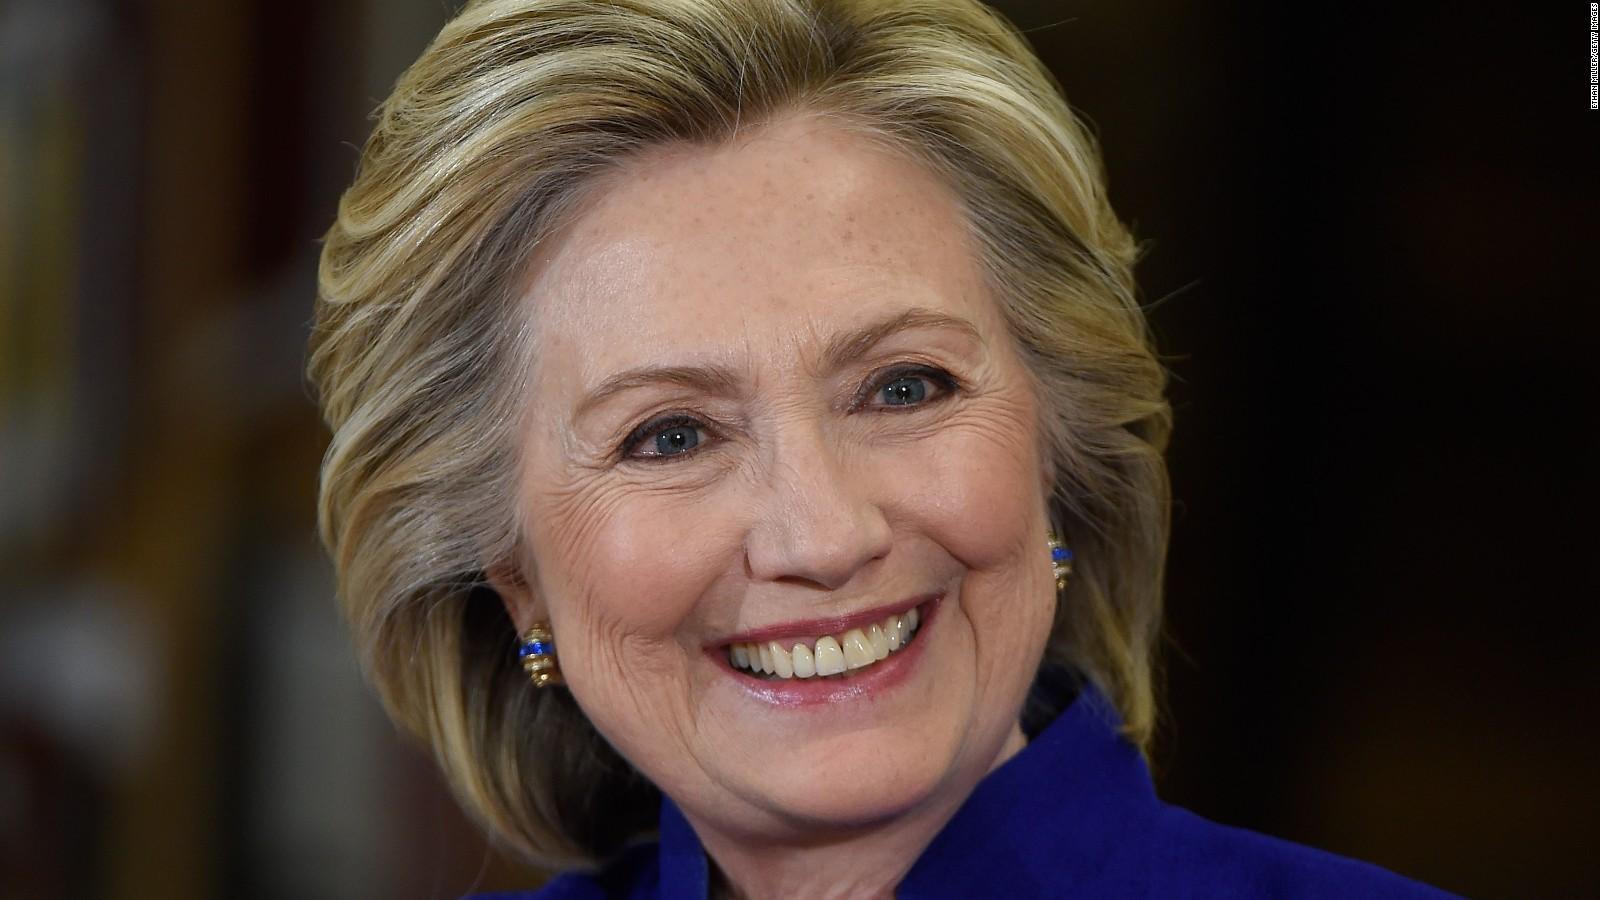 famous feminists - hillary clinton - hillary clinton headshot - hillary 2016 - political - politics - 2017